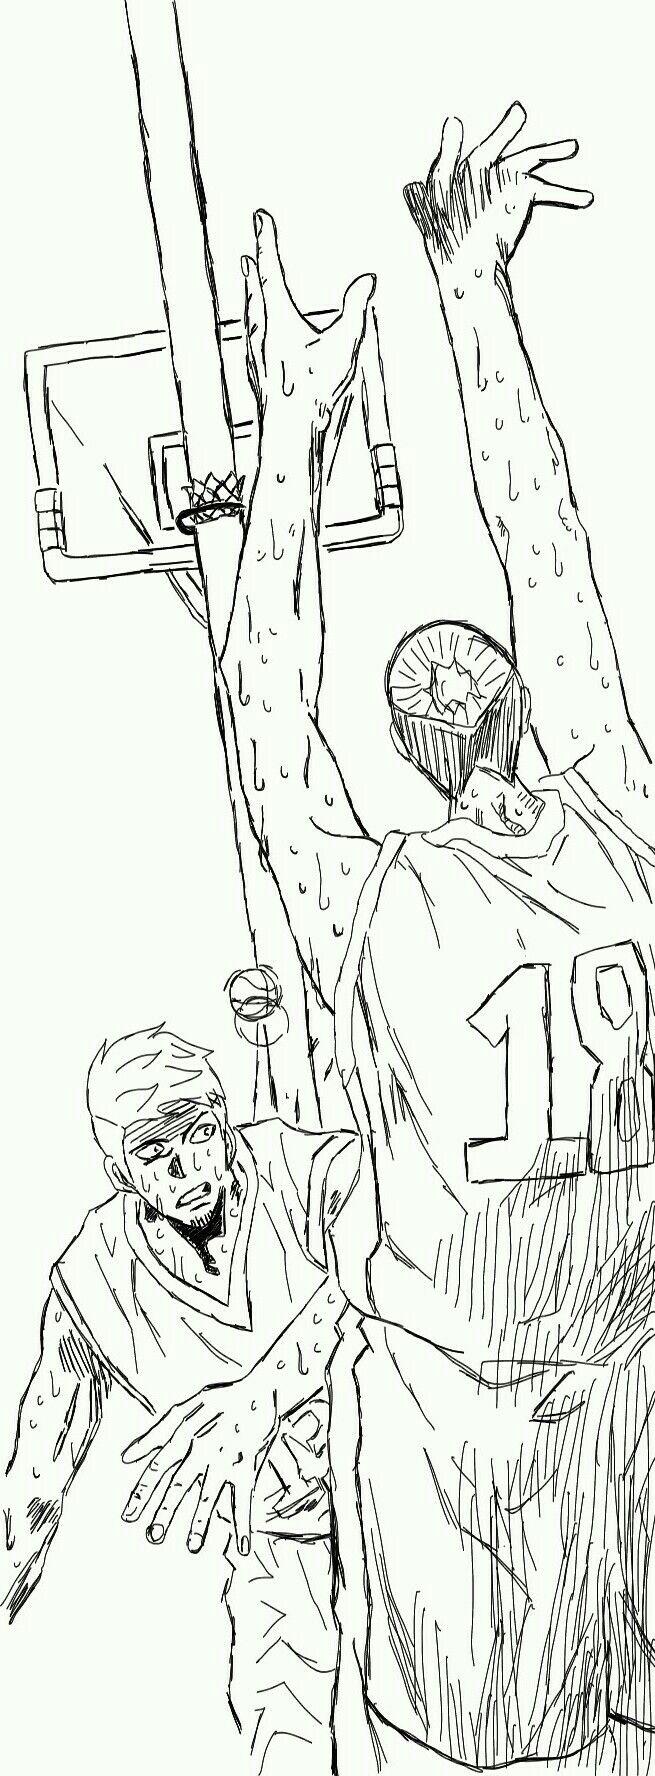 Kuroko no basket oc Takeda Asagi Vs Takeda Sora